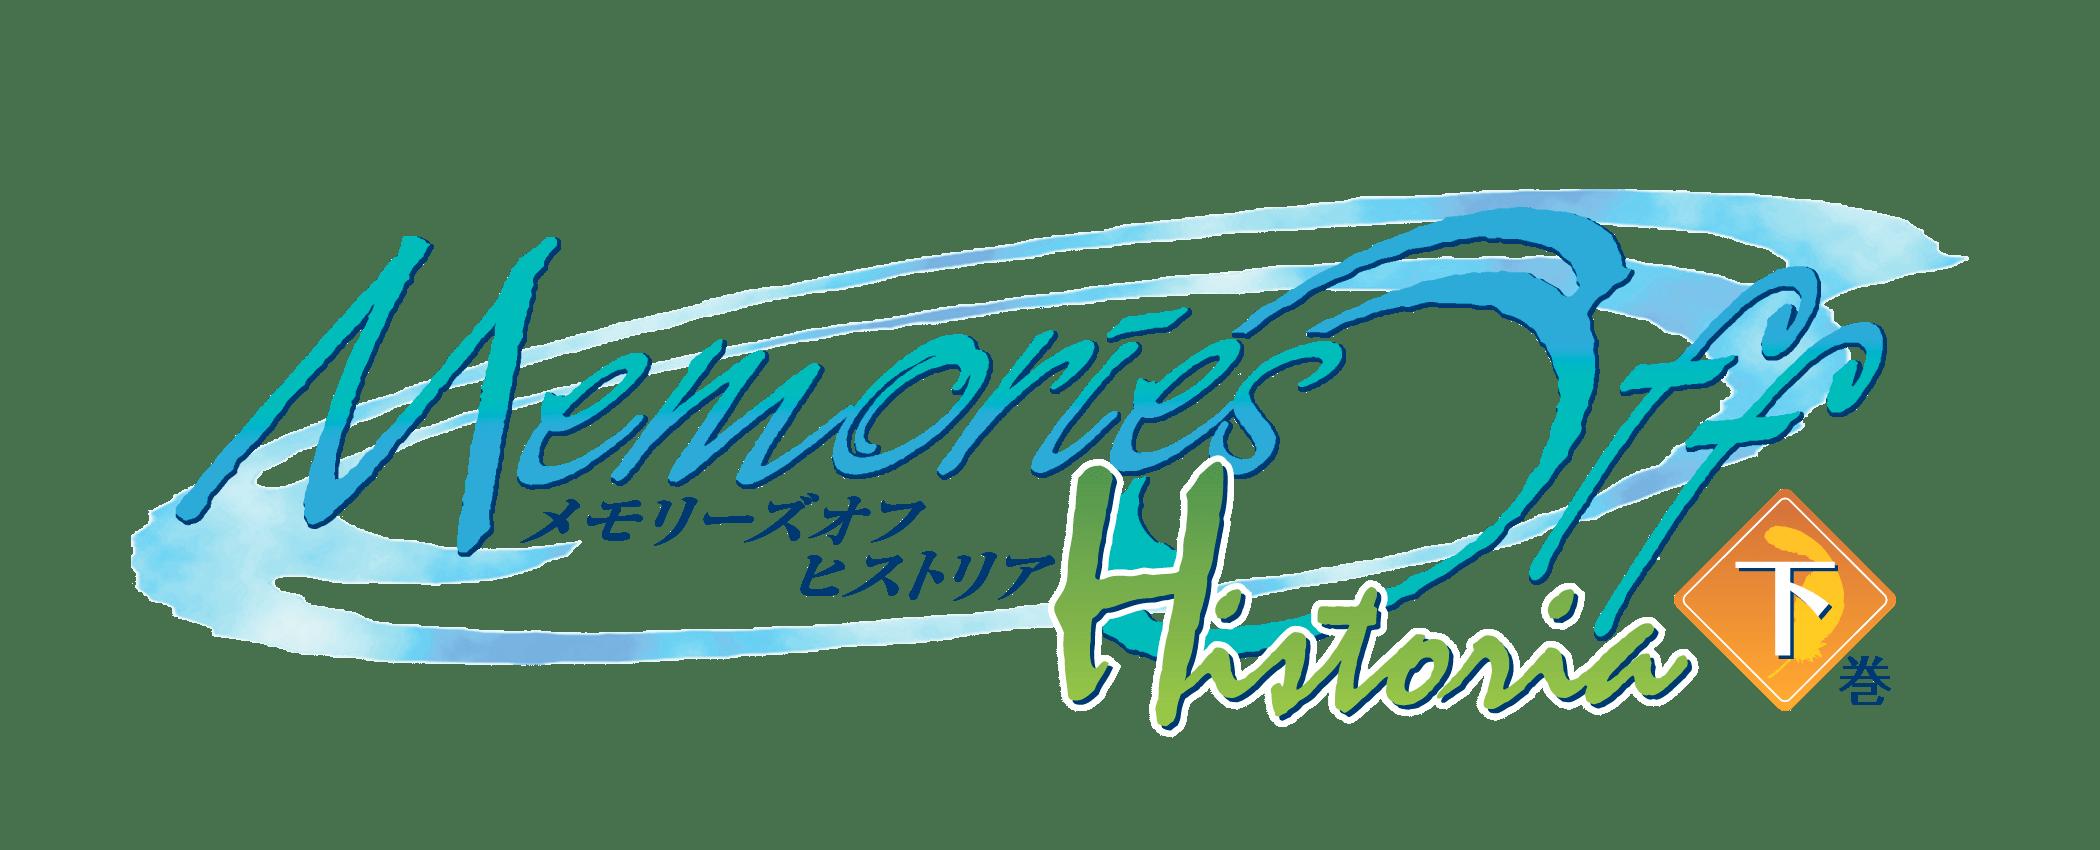 Memories-Off-Historia_2020_10-23-20_015